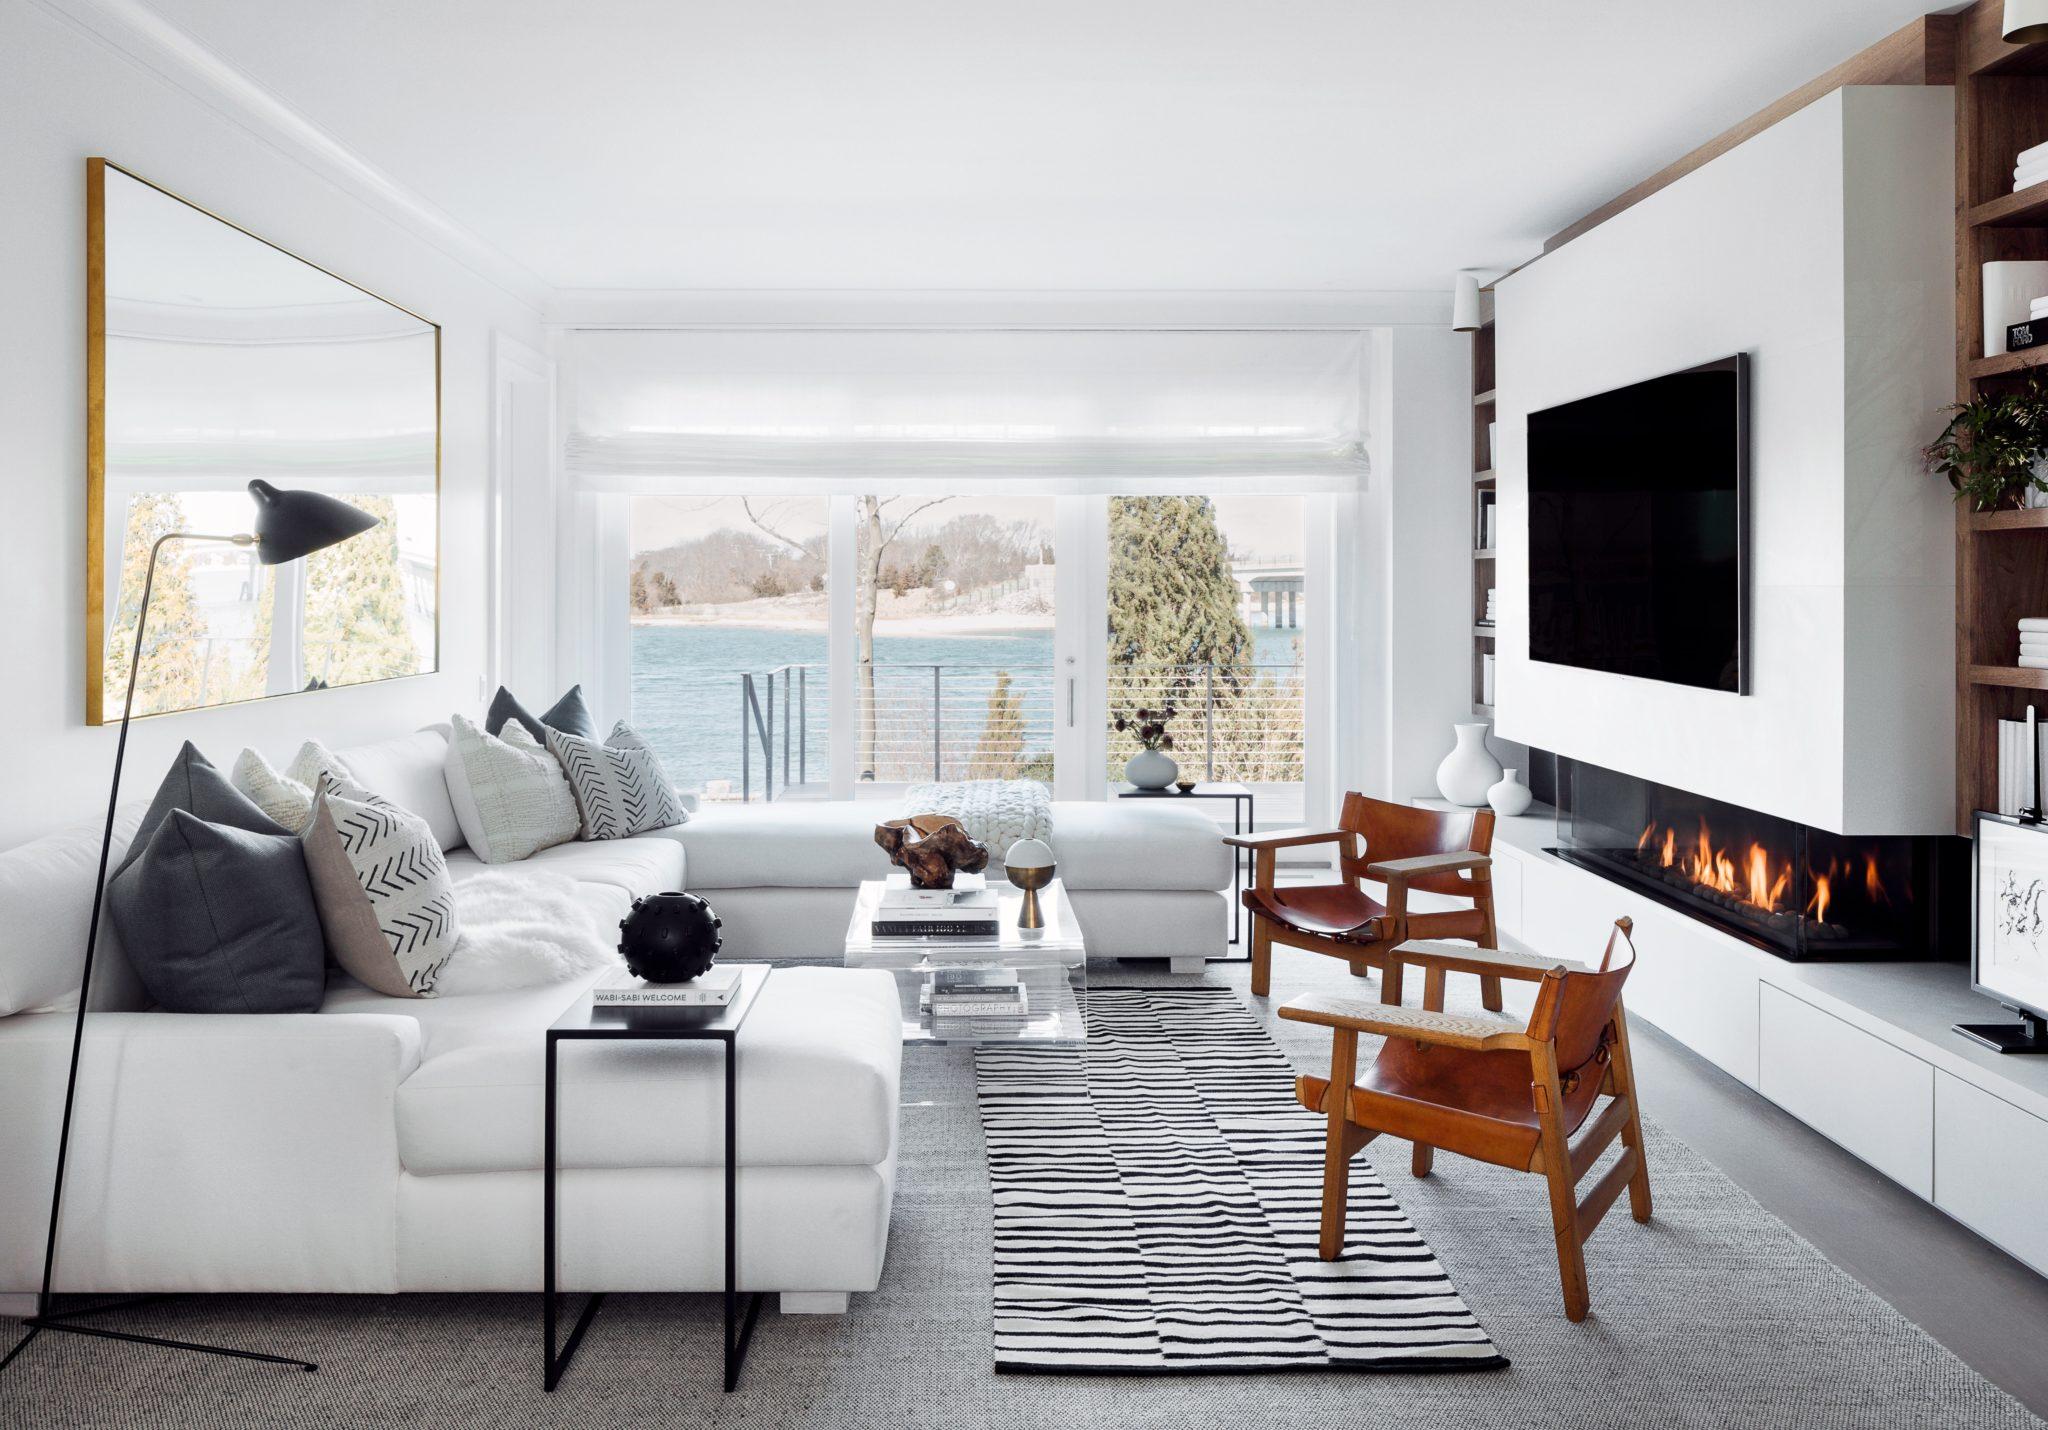 Sag Harbor Waterfront Living Room by Winter McDermott Design